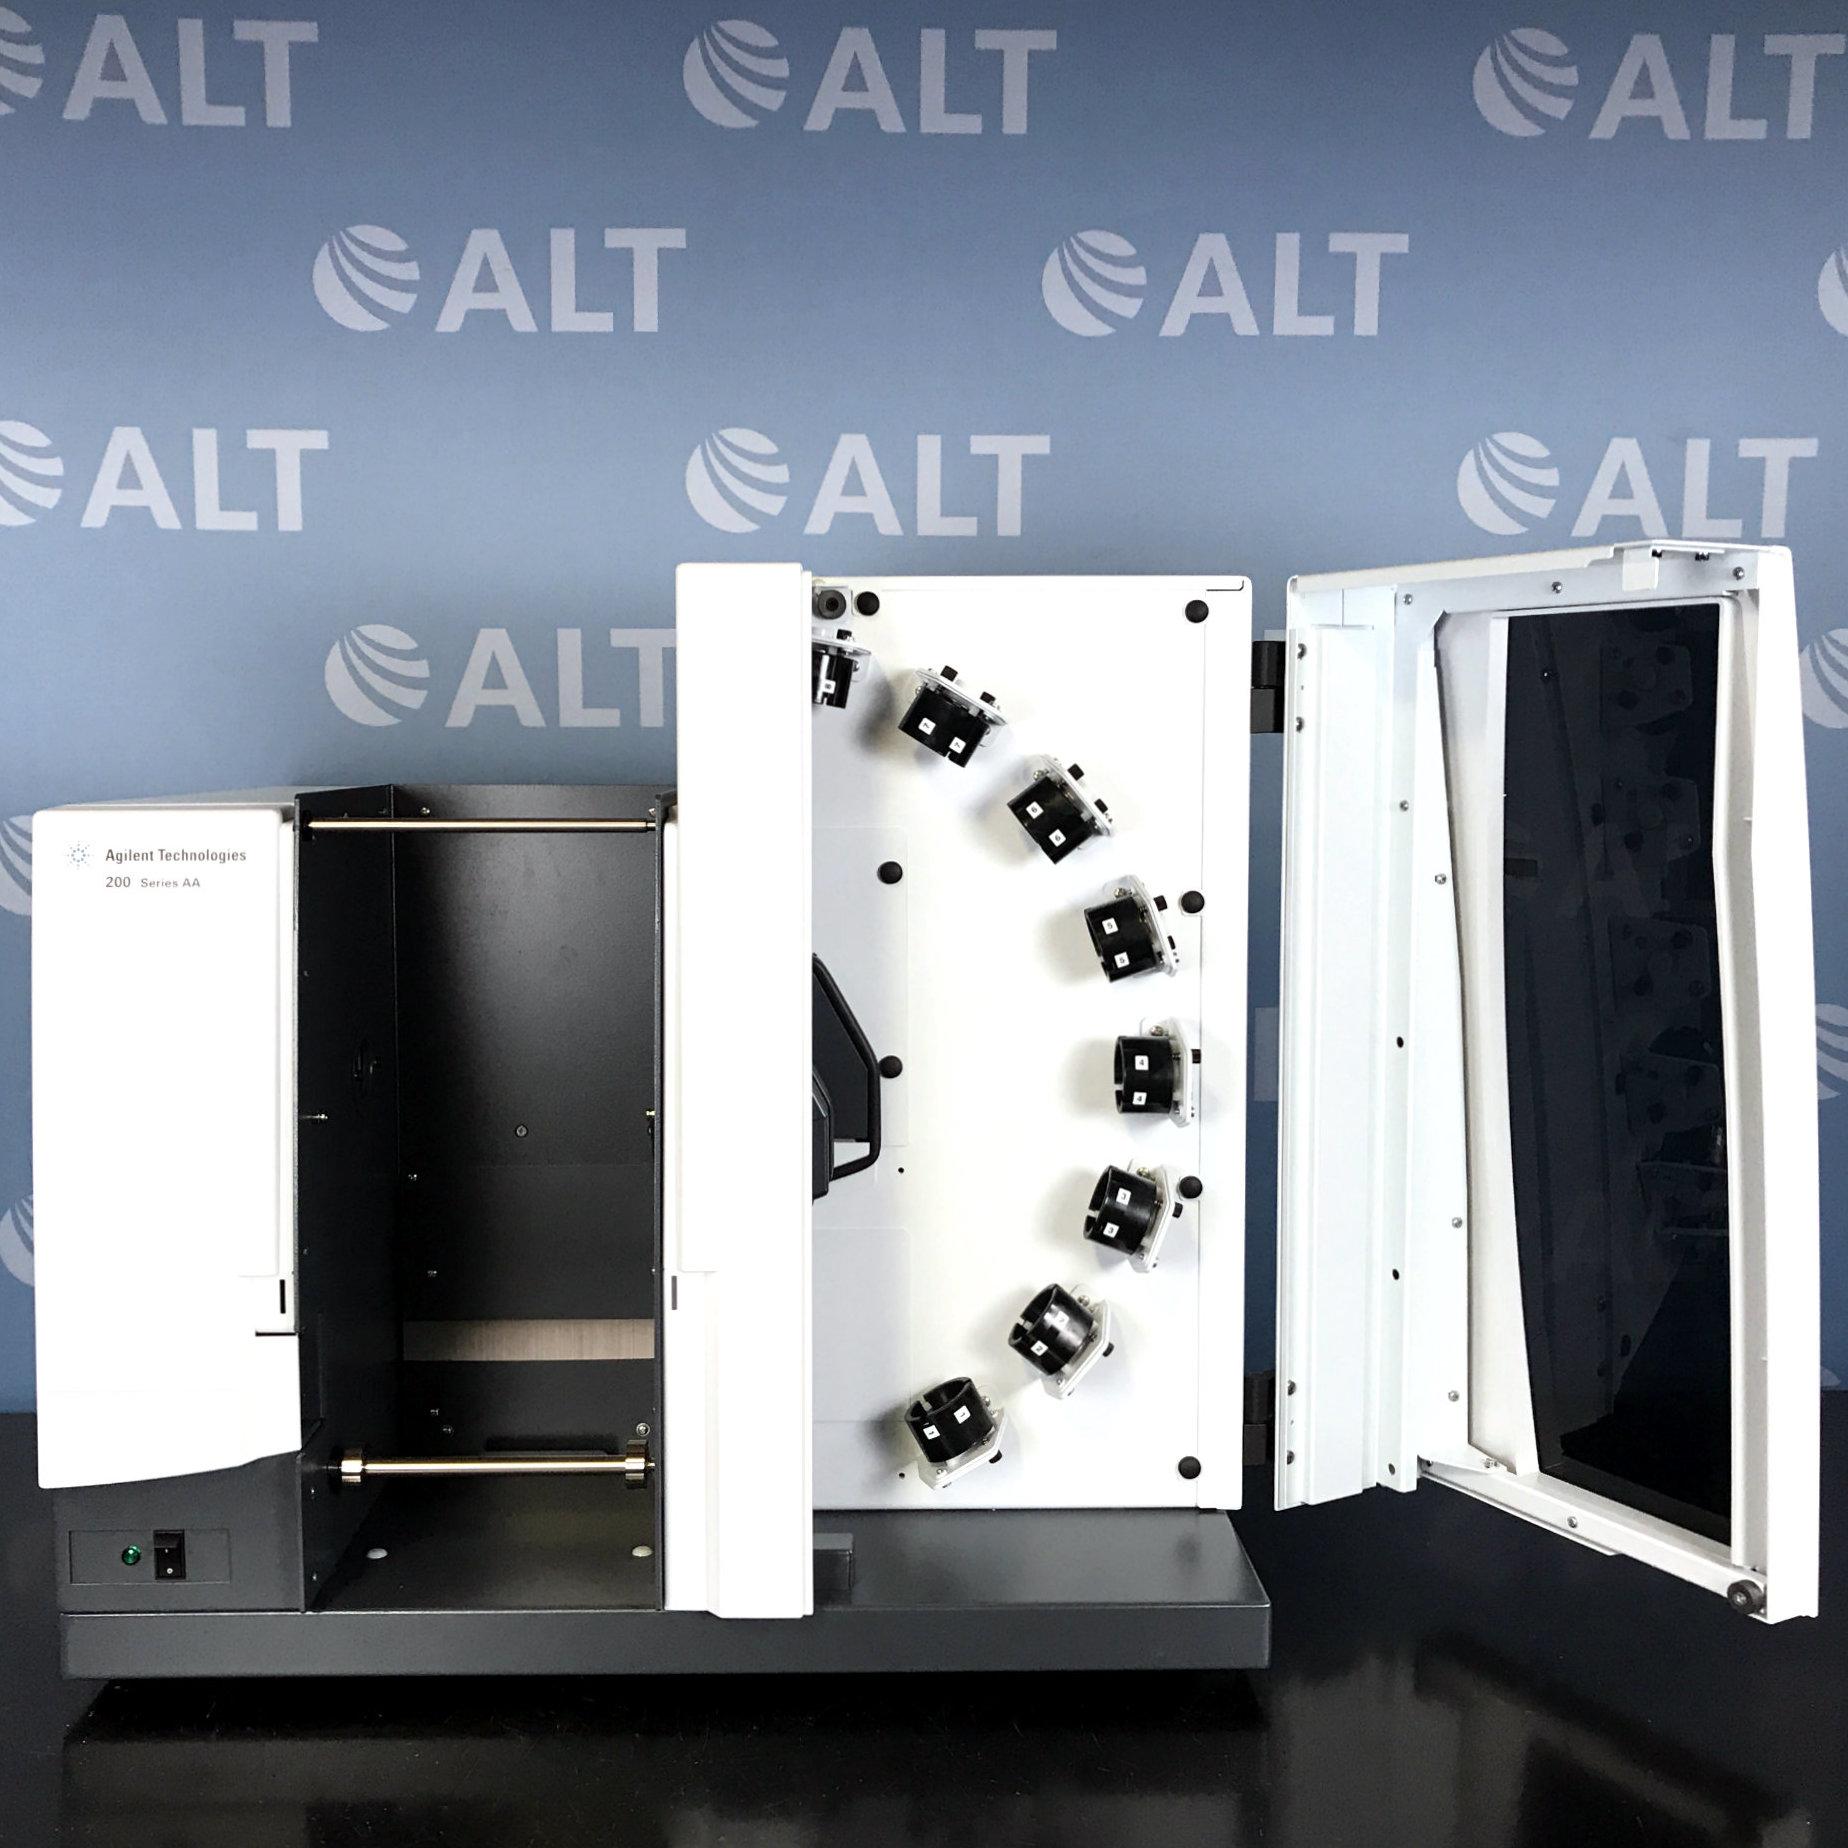 Agilent Technologies 280Z AA Spectrometer Model G8437A Image